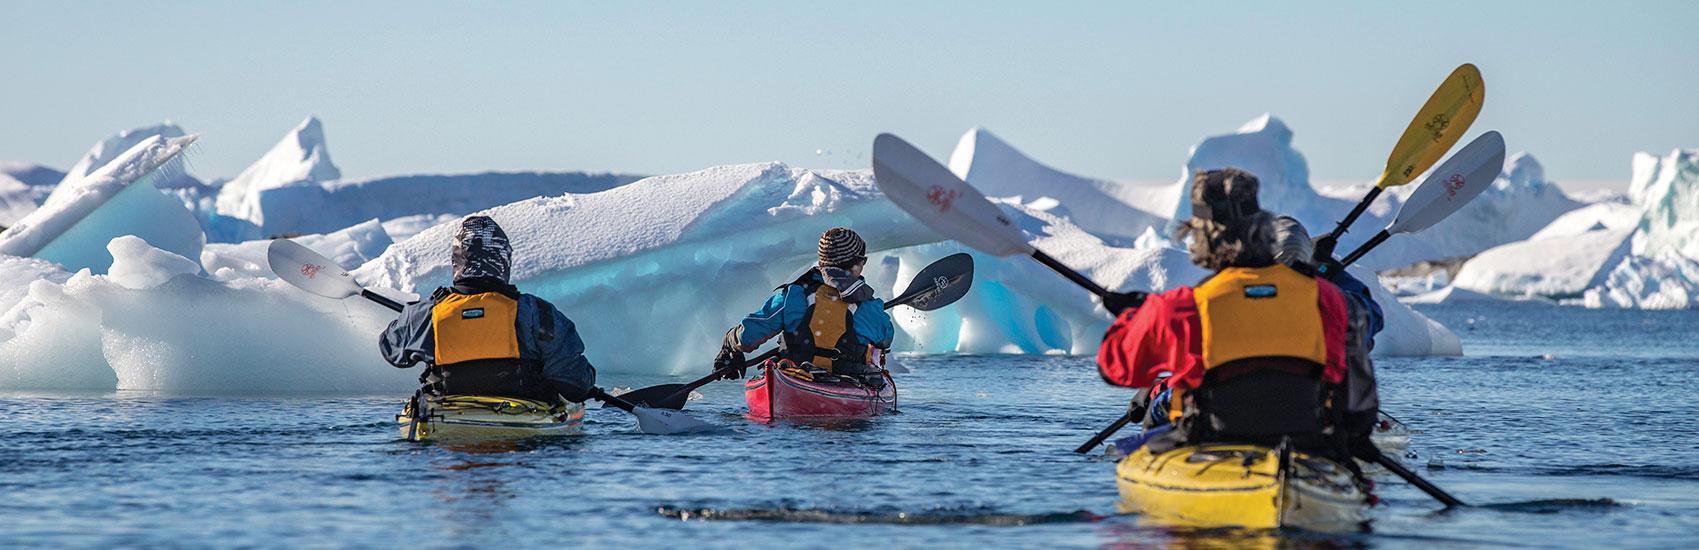 Savings to Antarctica with Intrepid Travel 3